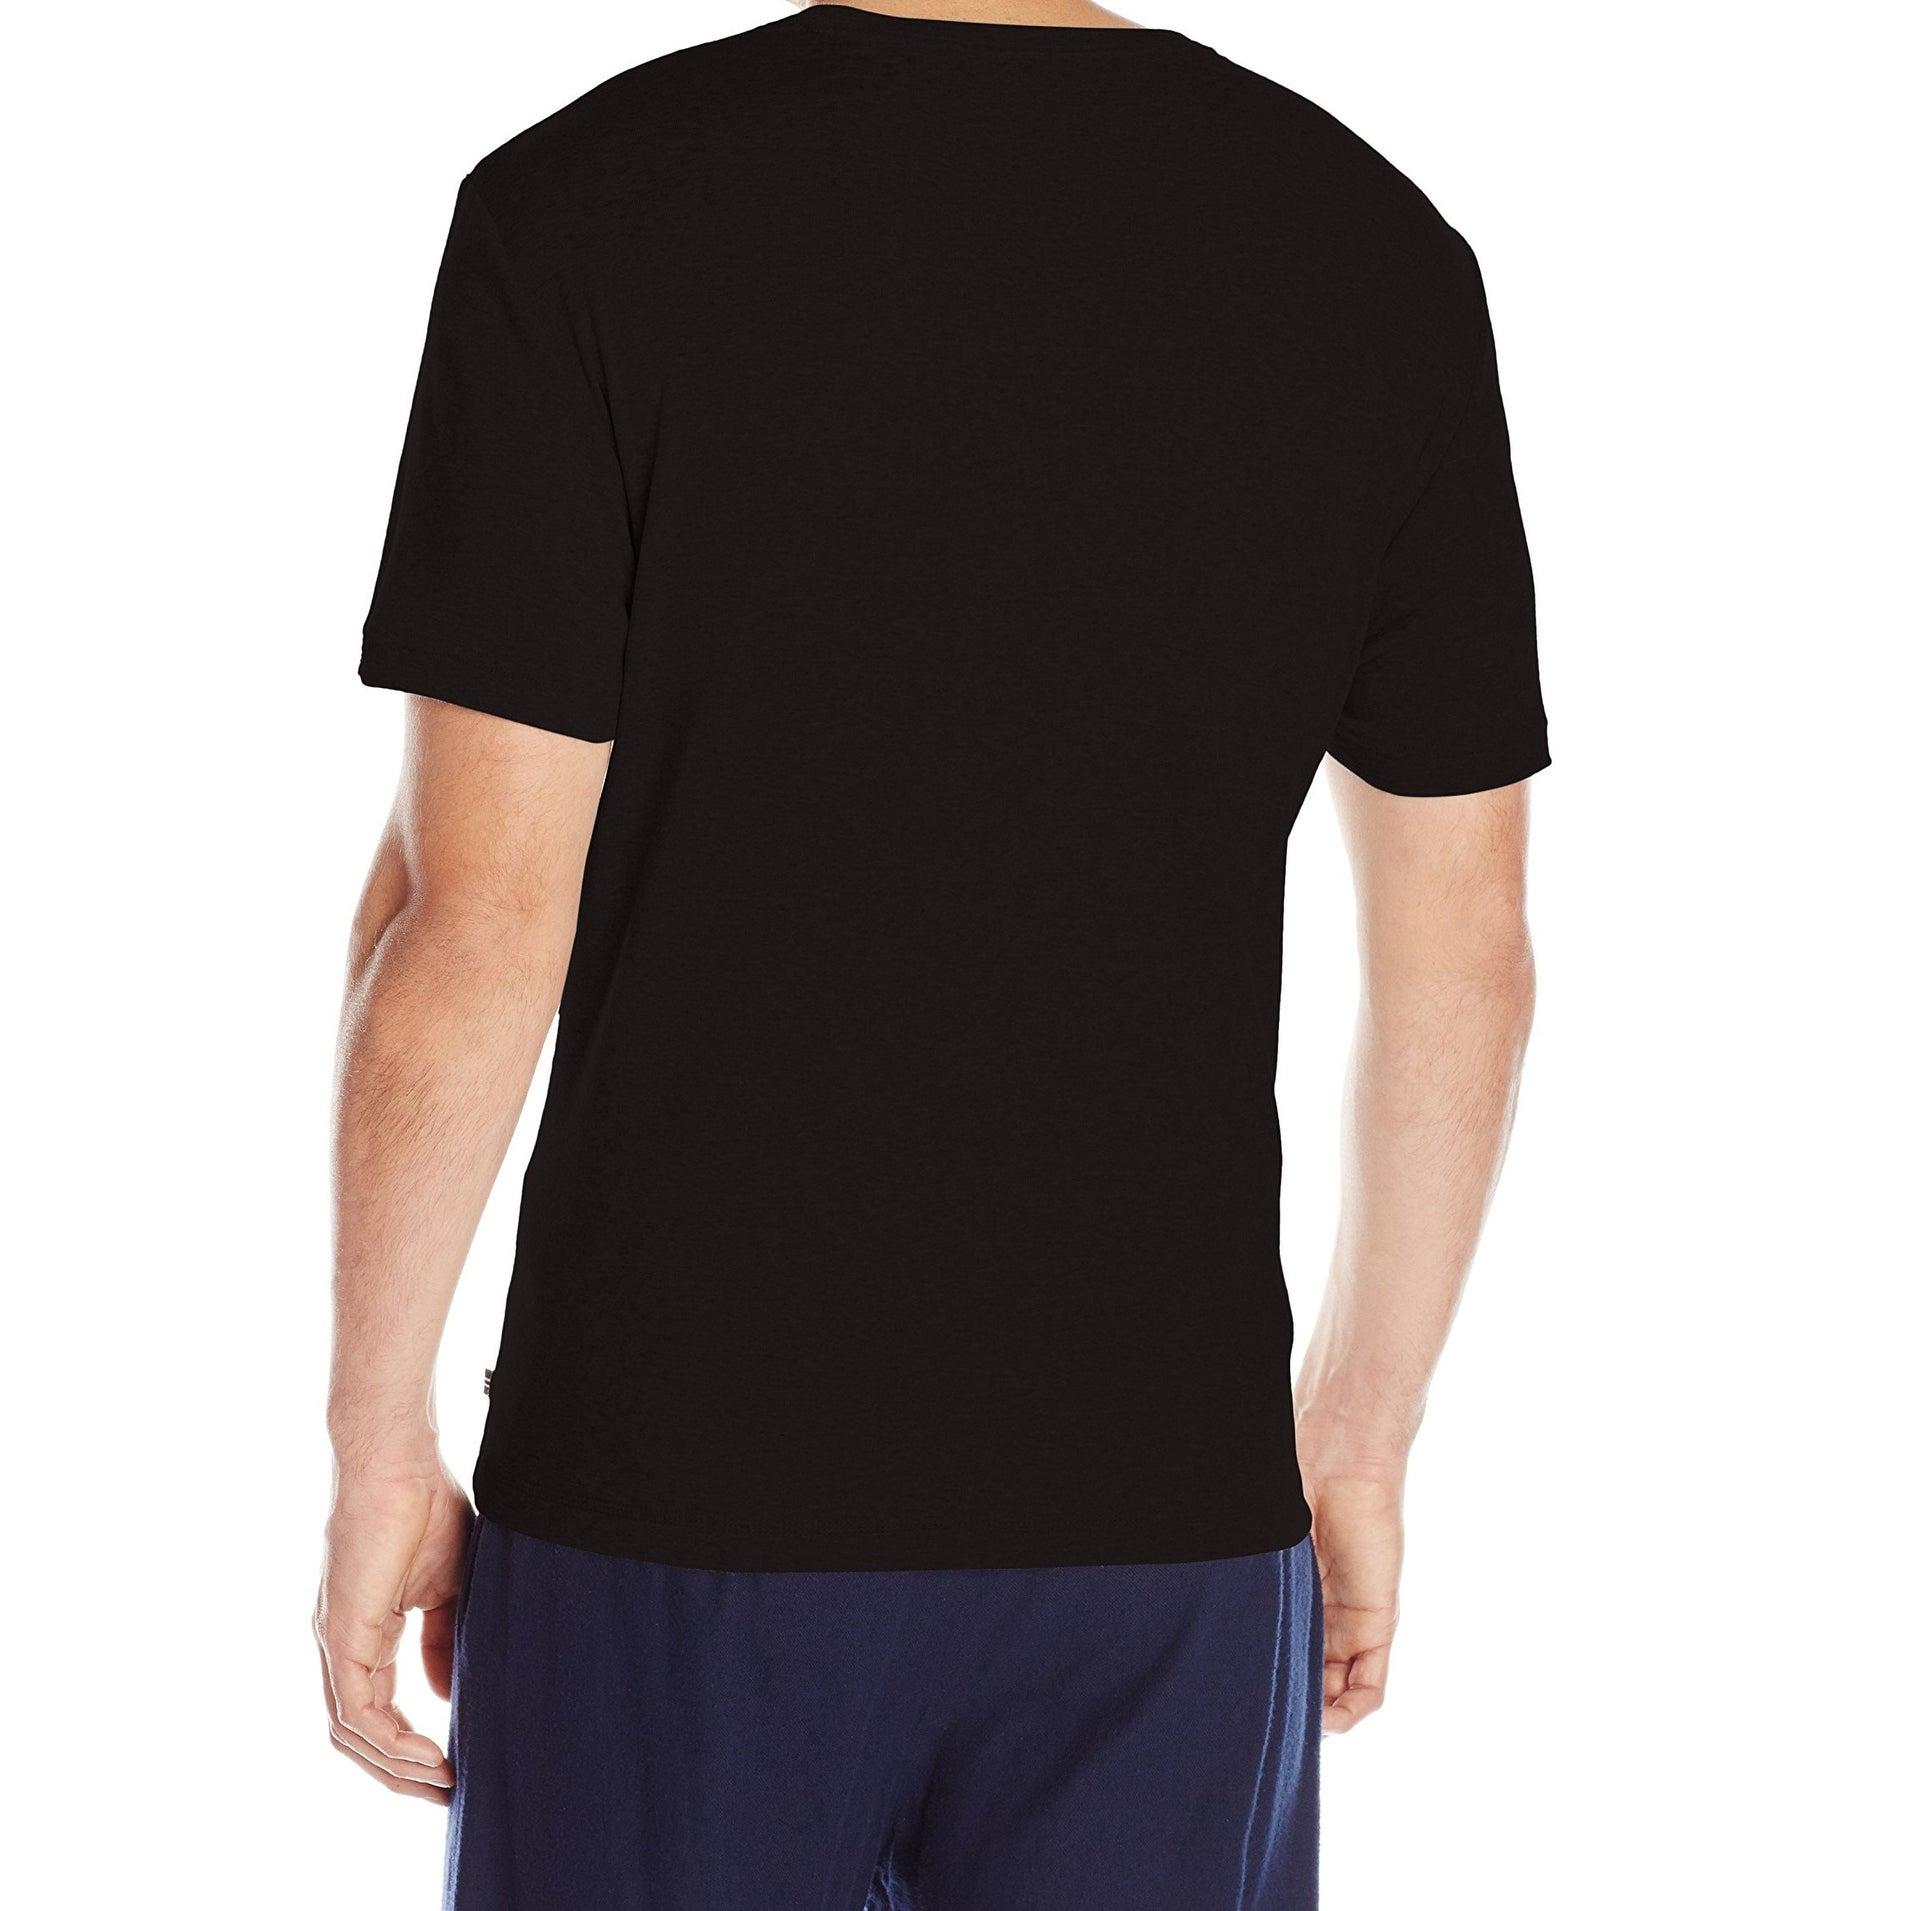 ceb238c99ae Shop Nautica NEW Black Mens Size Medium M Solid Crewneck Sleepwear T-Shirt  - Free Shipping On Orders Over $45 - Overstock - 19573319